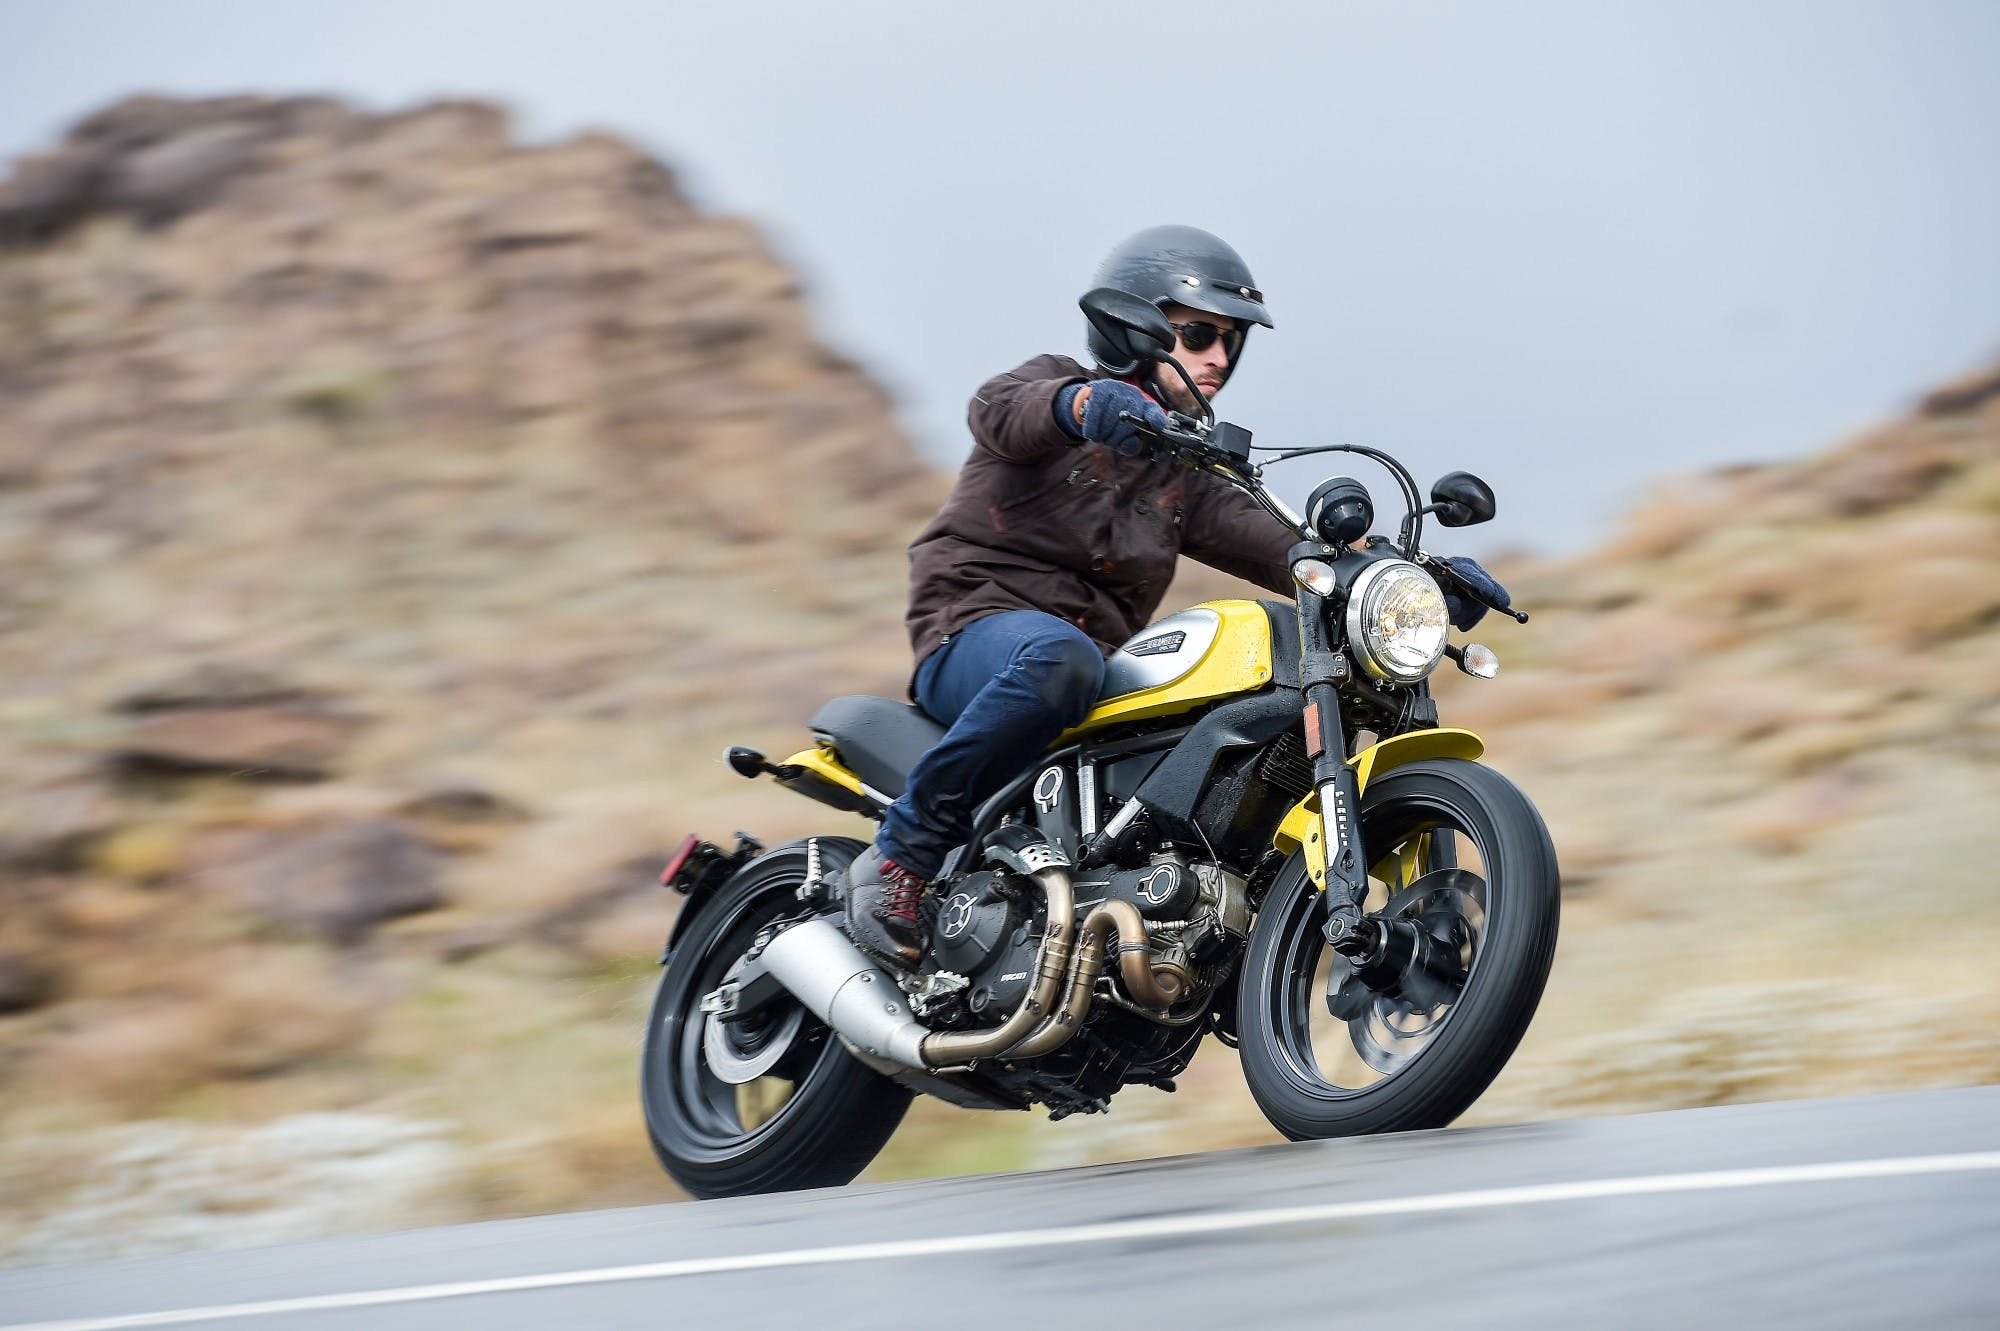 DucatiScrambler201506